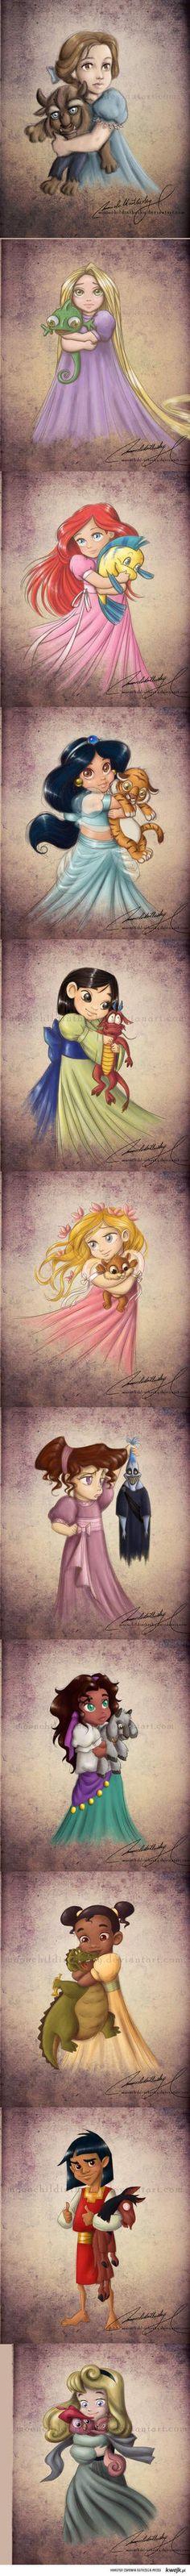 Disney Princesses with Their Favorite Stuffed Animals.